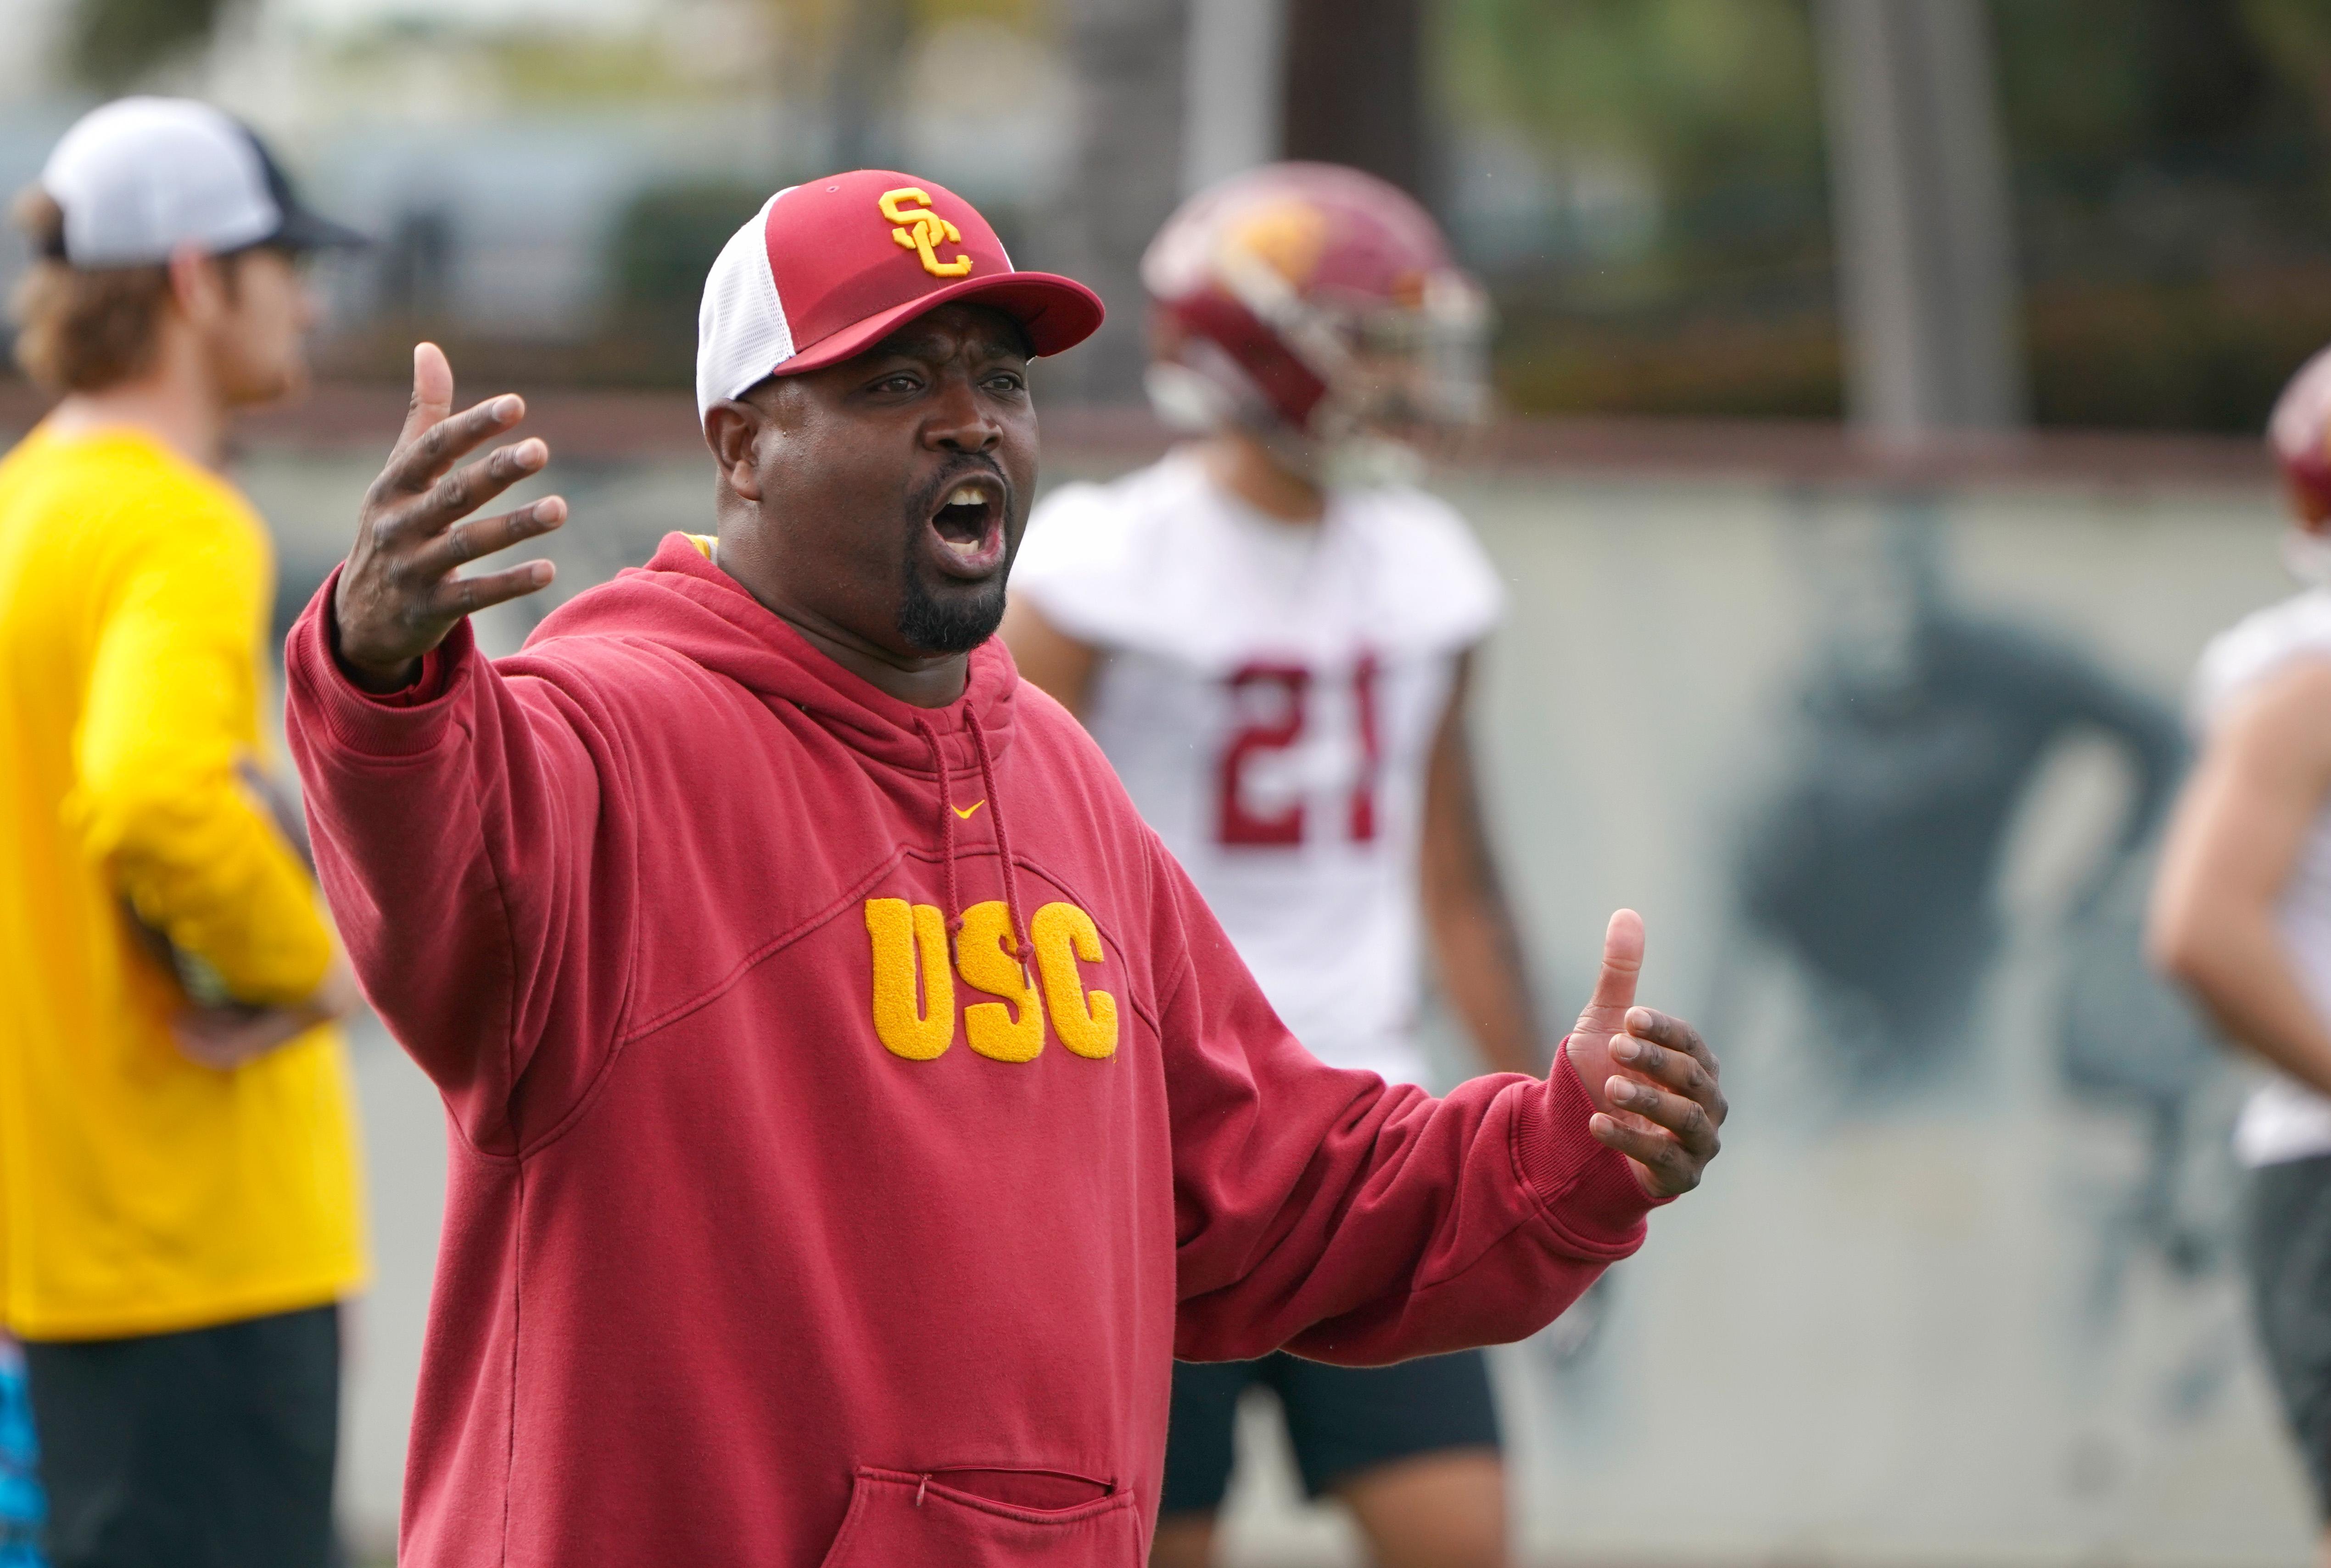 USC Spring Football Practice Begins